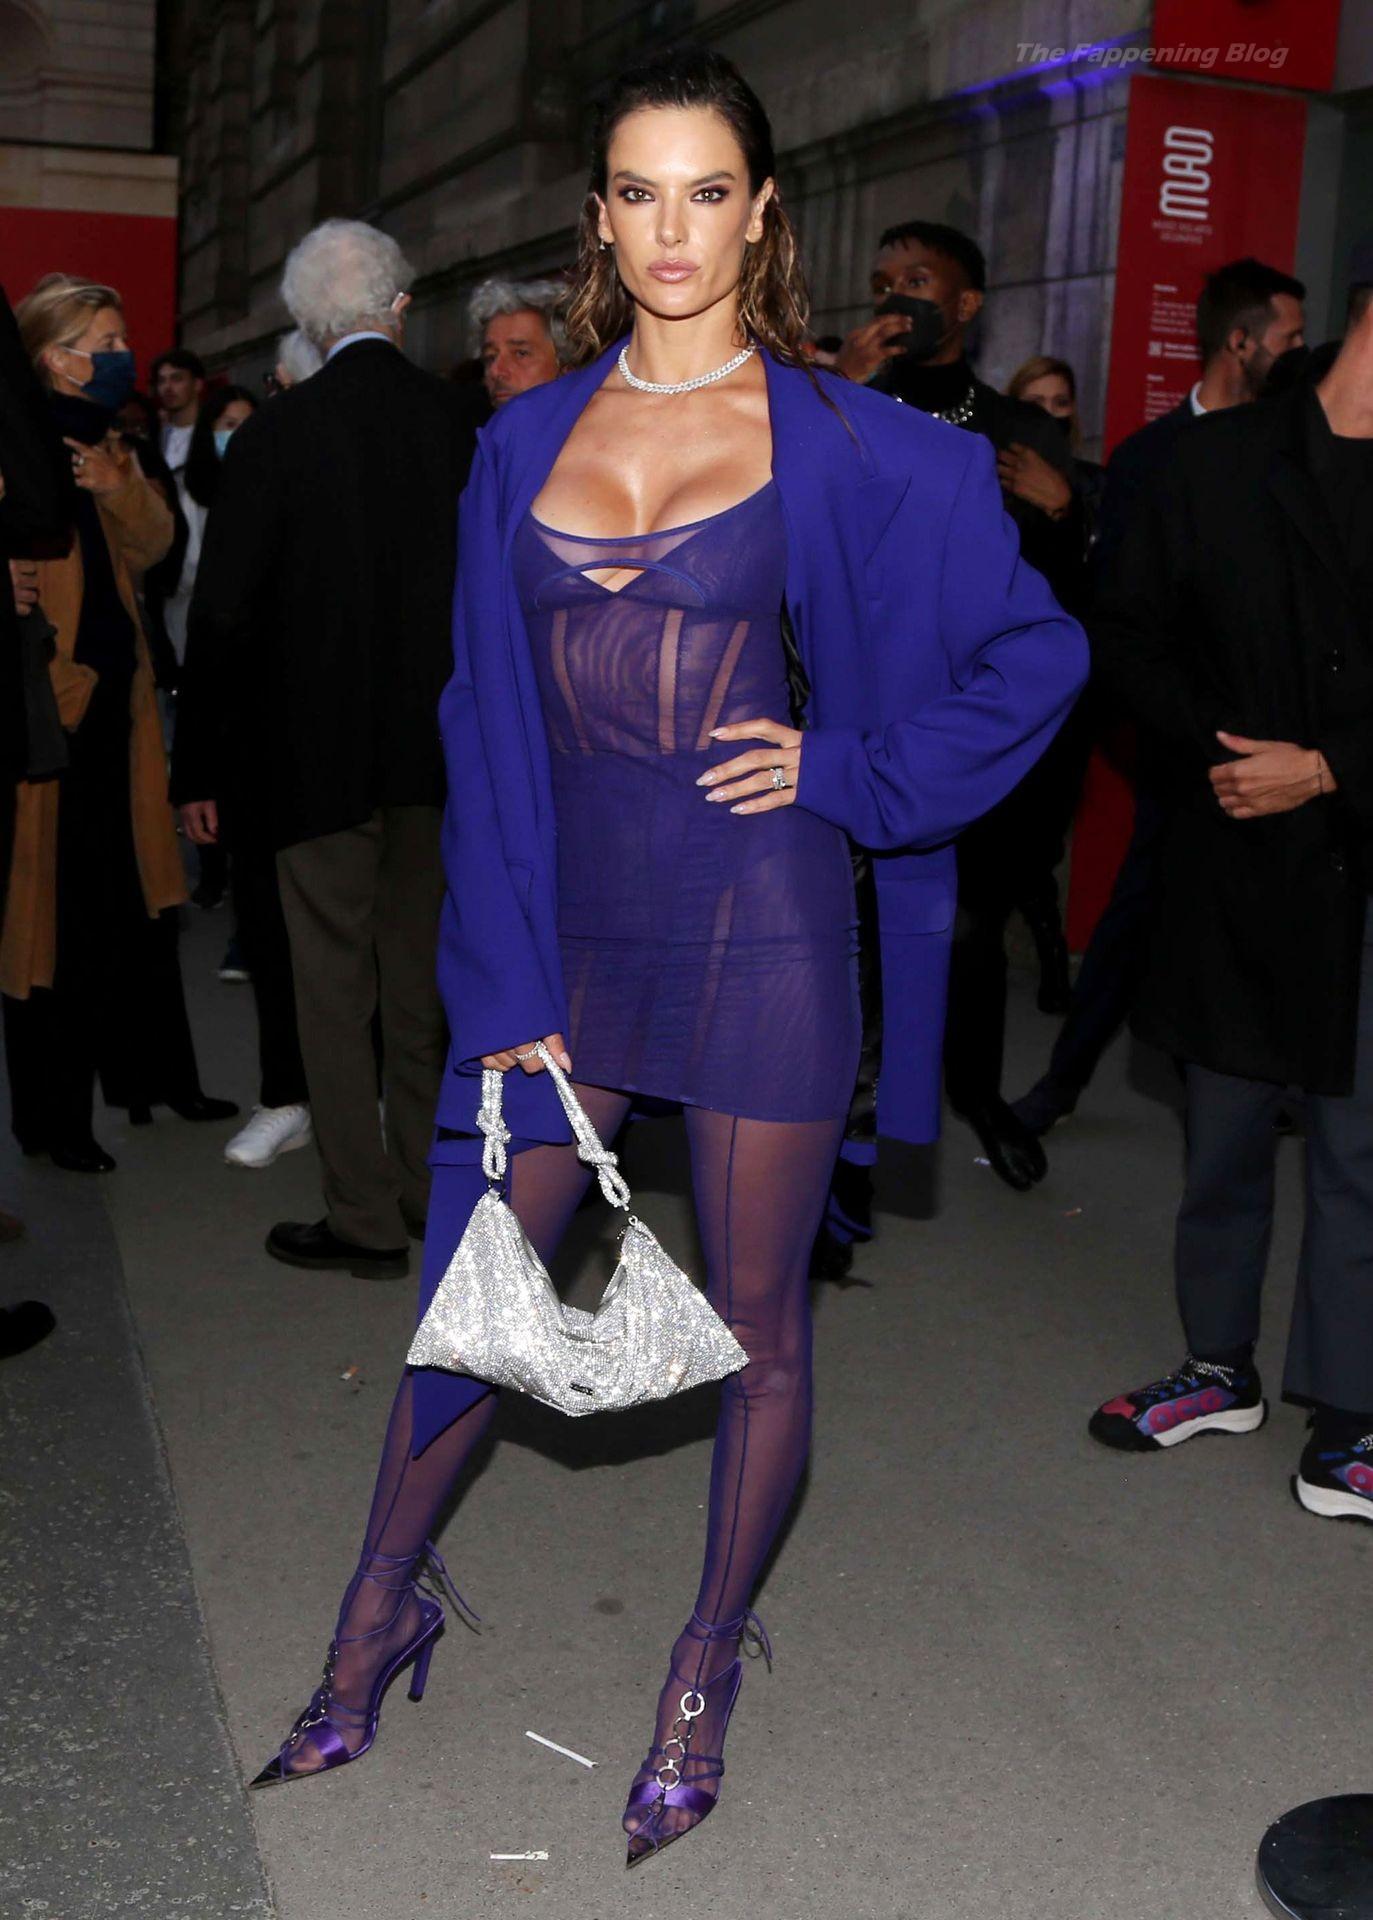 Alessandra-Ambrosio-Sexy-The-Fappening-Blog-105-1.jpg